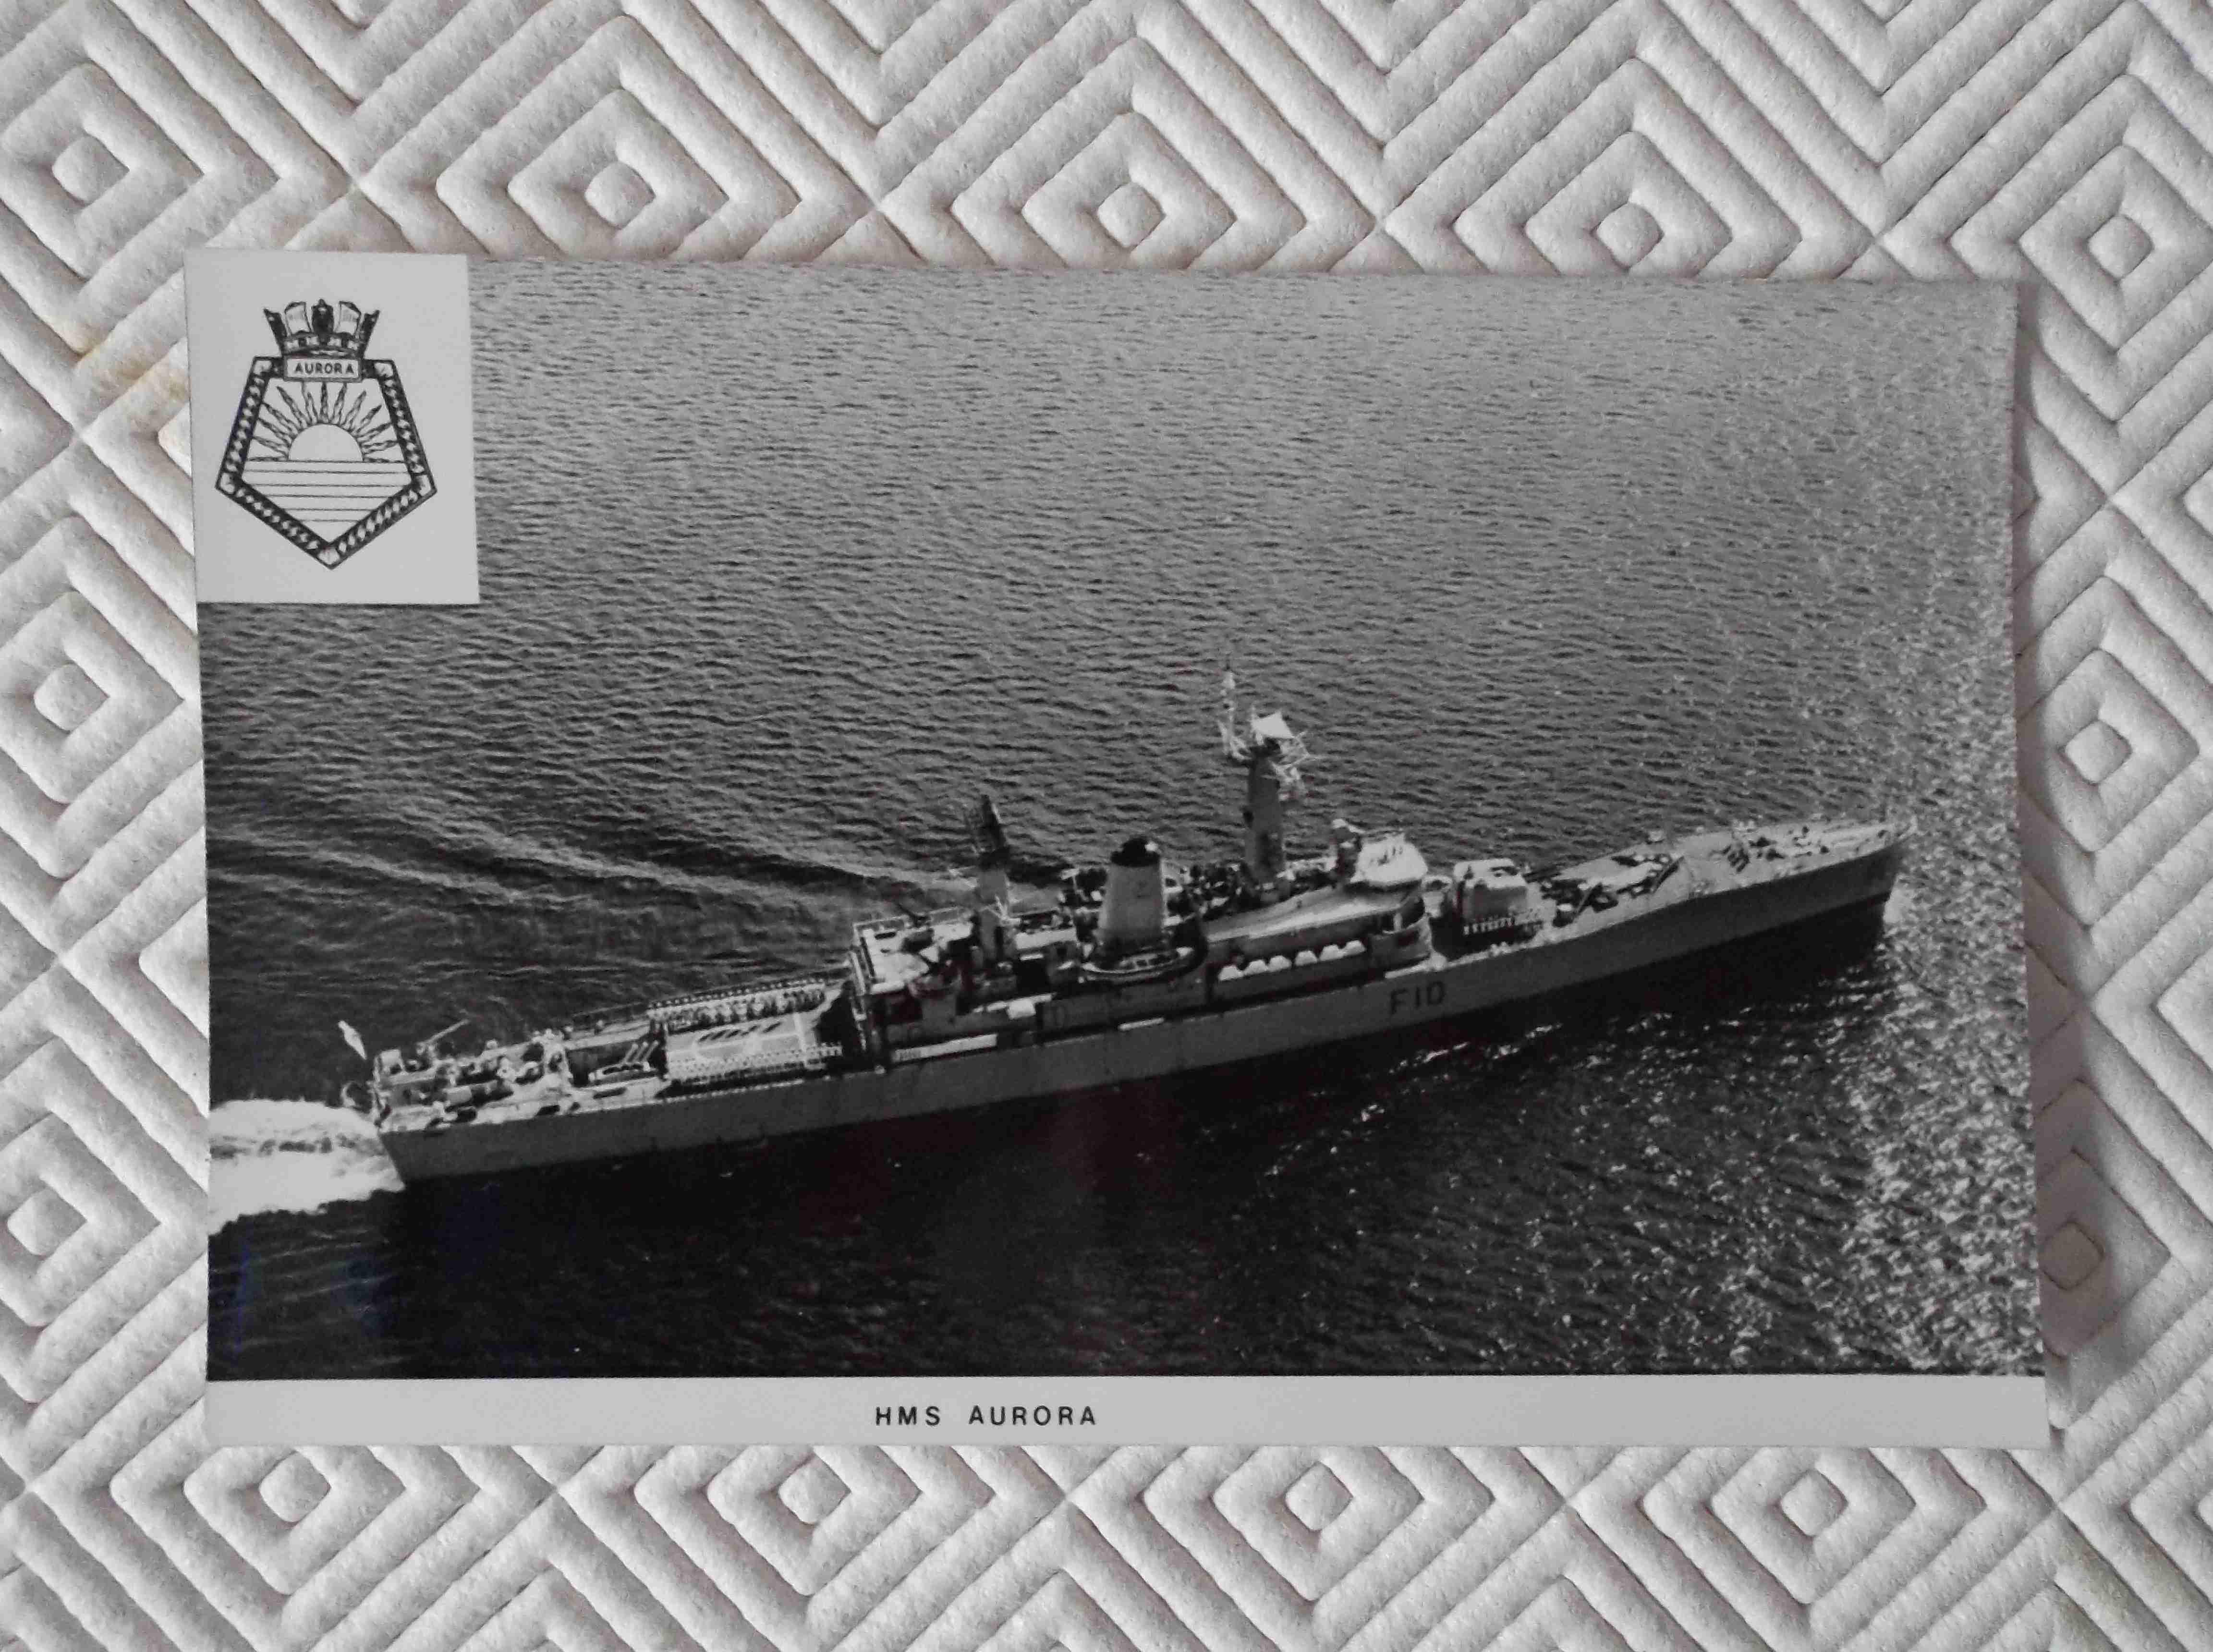 POSTCARD SIZE PHOTOGRAPH OF THE ROYAL NAVAL VESSEL HMS AURORA